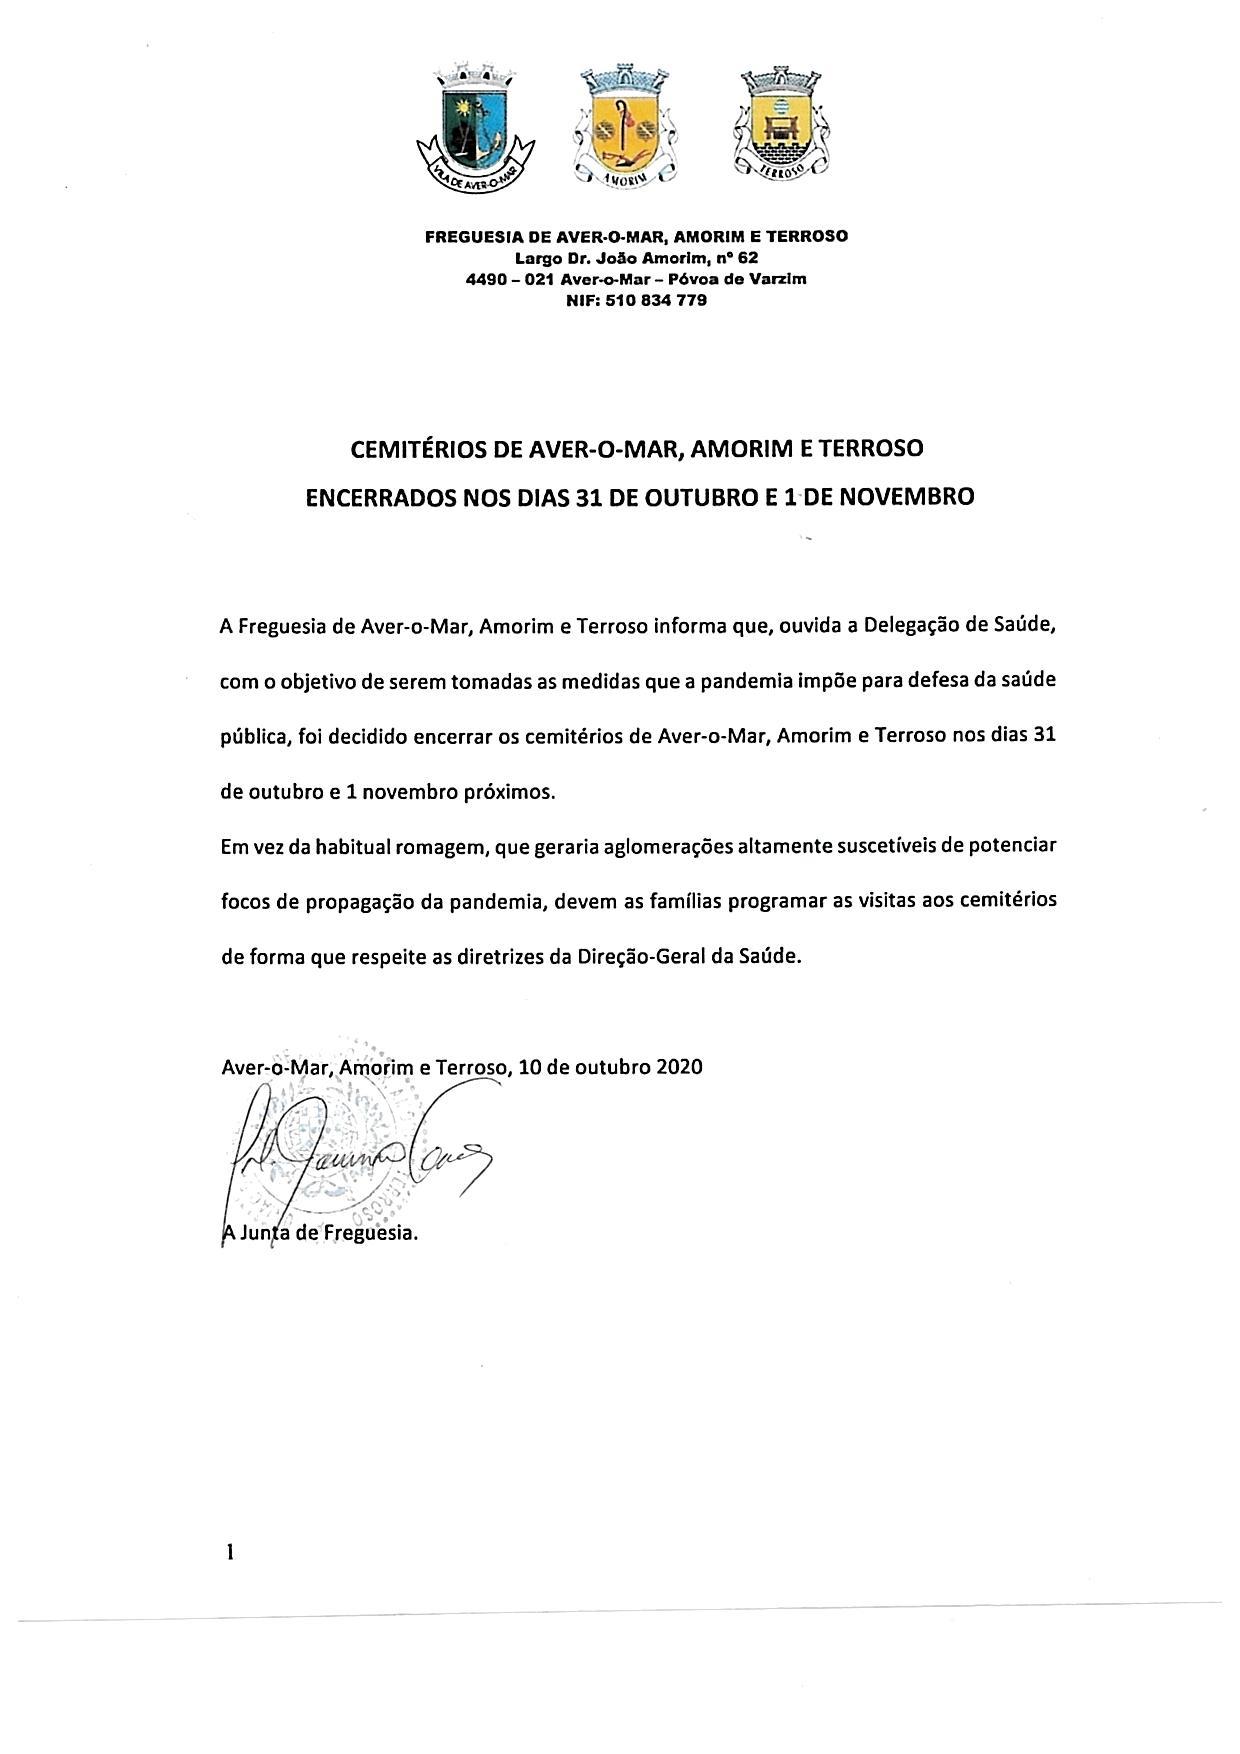 ENCERRAMENTO DOS CEMITÉRIOS DE AVER-O-MAR, AMORIM E TERROSO – DIA DOS FIÉIS DEFUNTO 2020